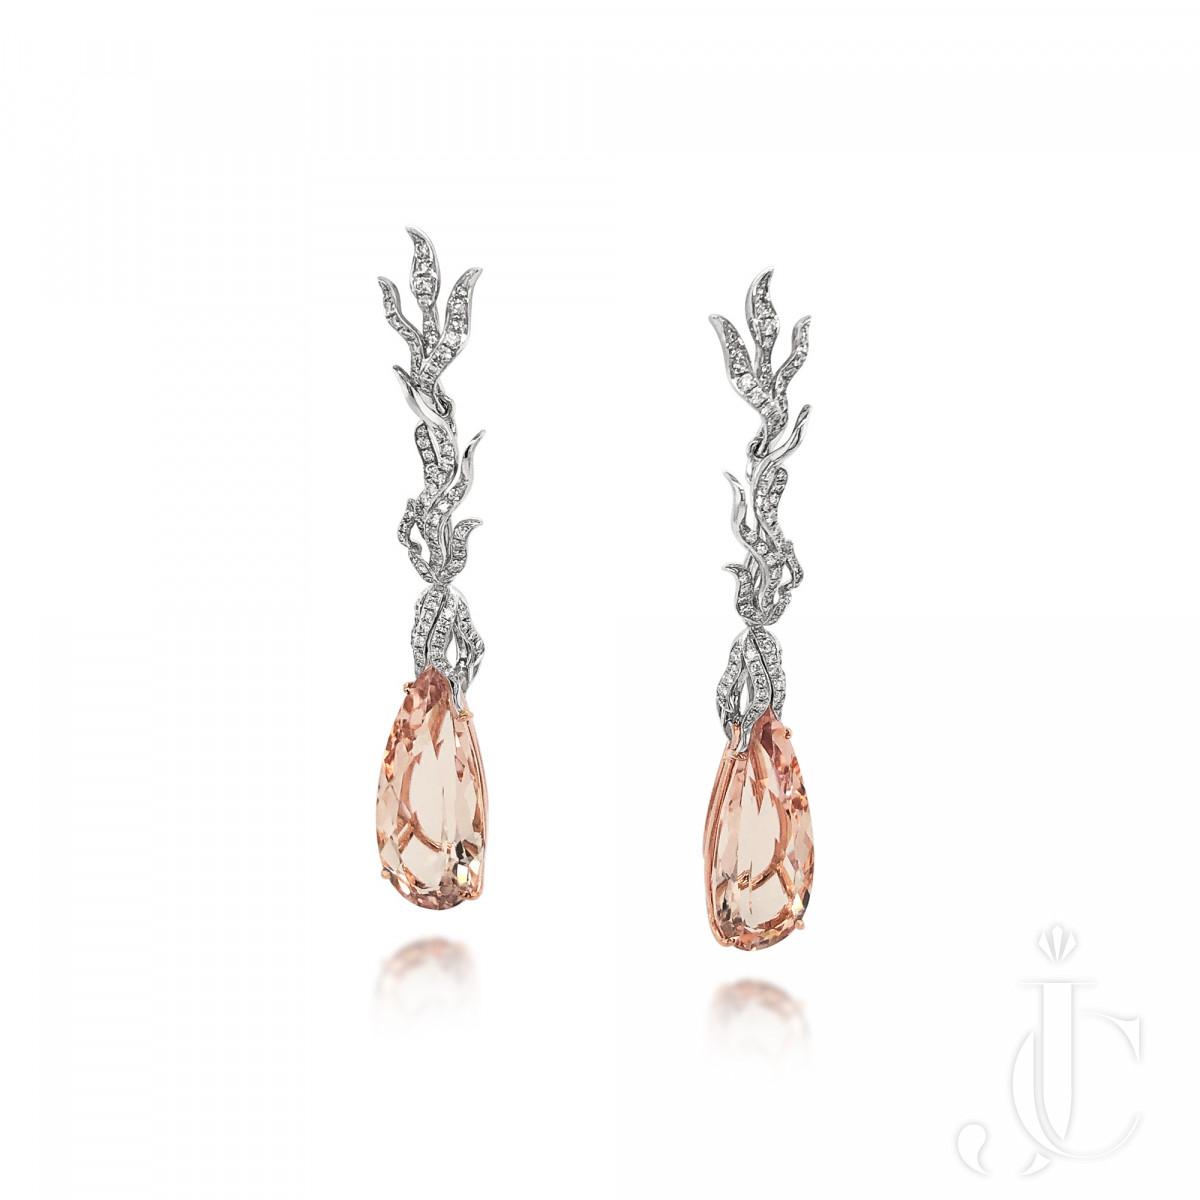 An Order of Bling Morganite and Diamond Earrings